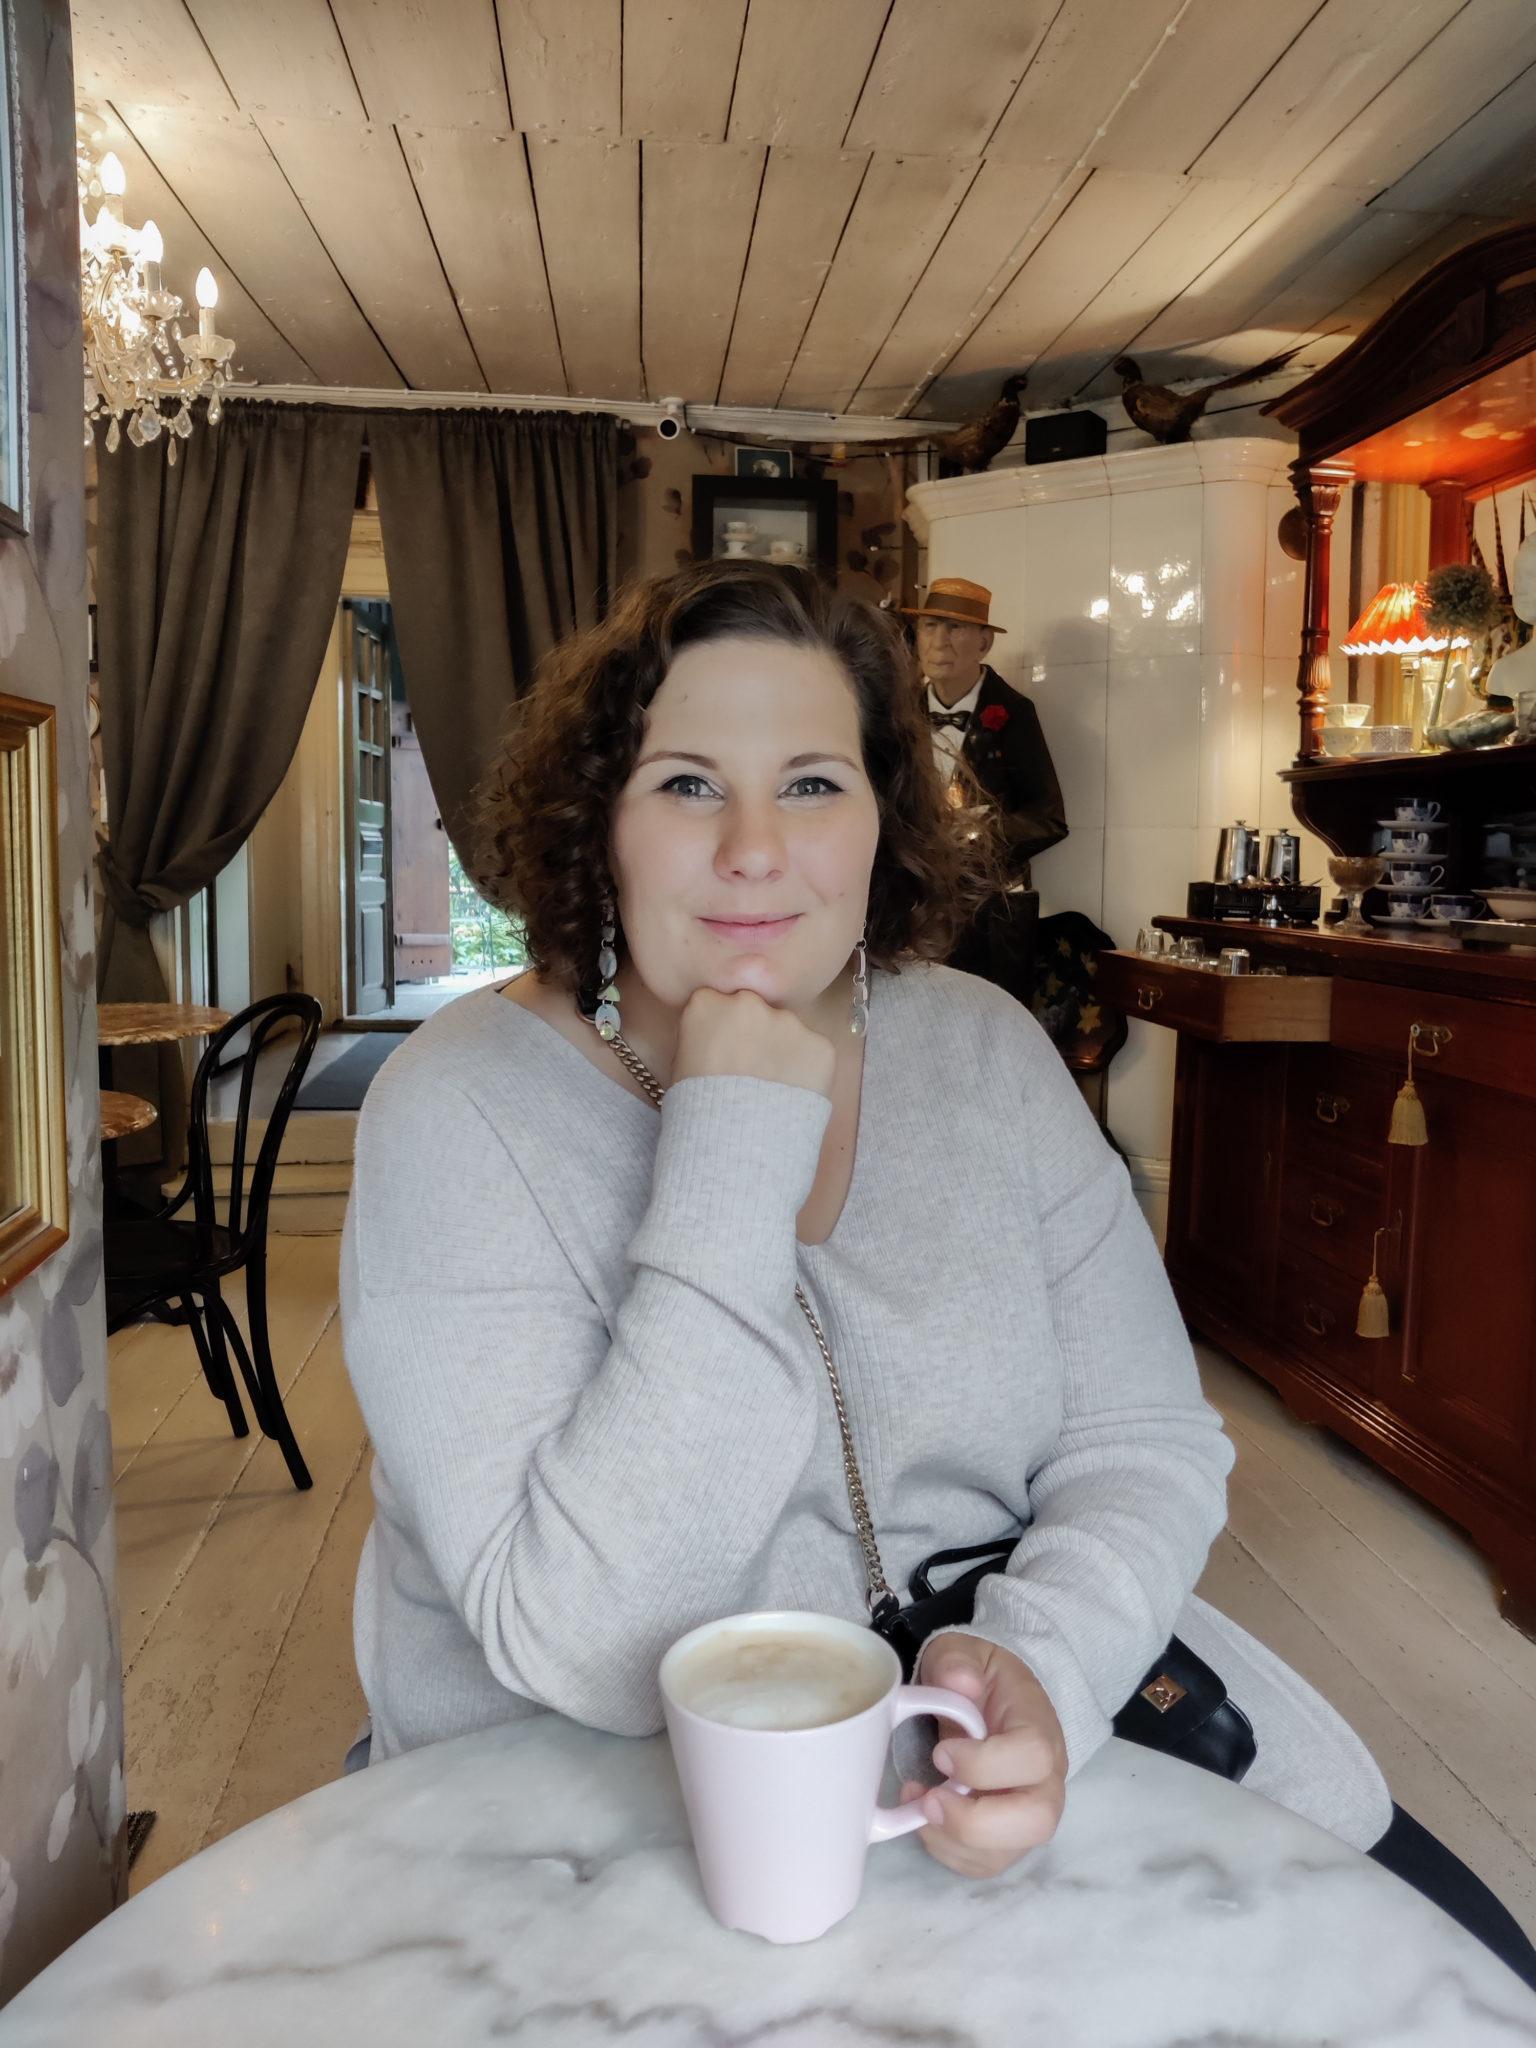 Teehuone - Vanha Porvoo - BMH - Big mamas home by Jenni